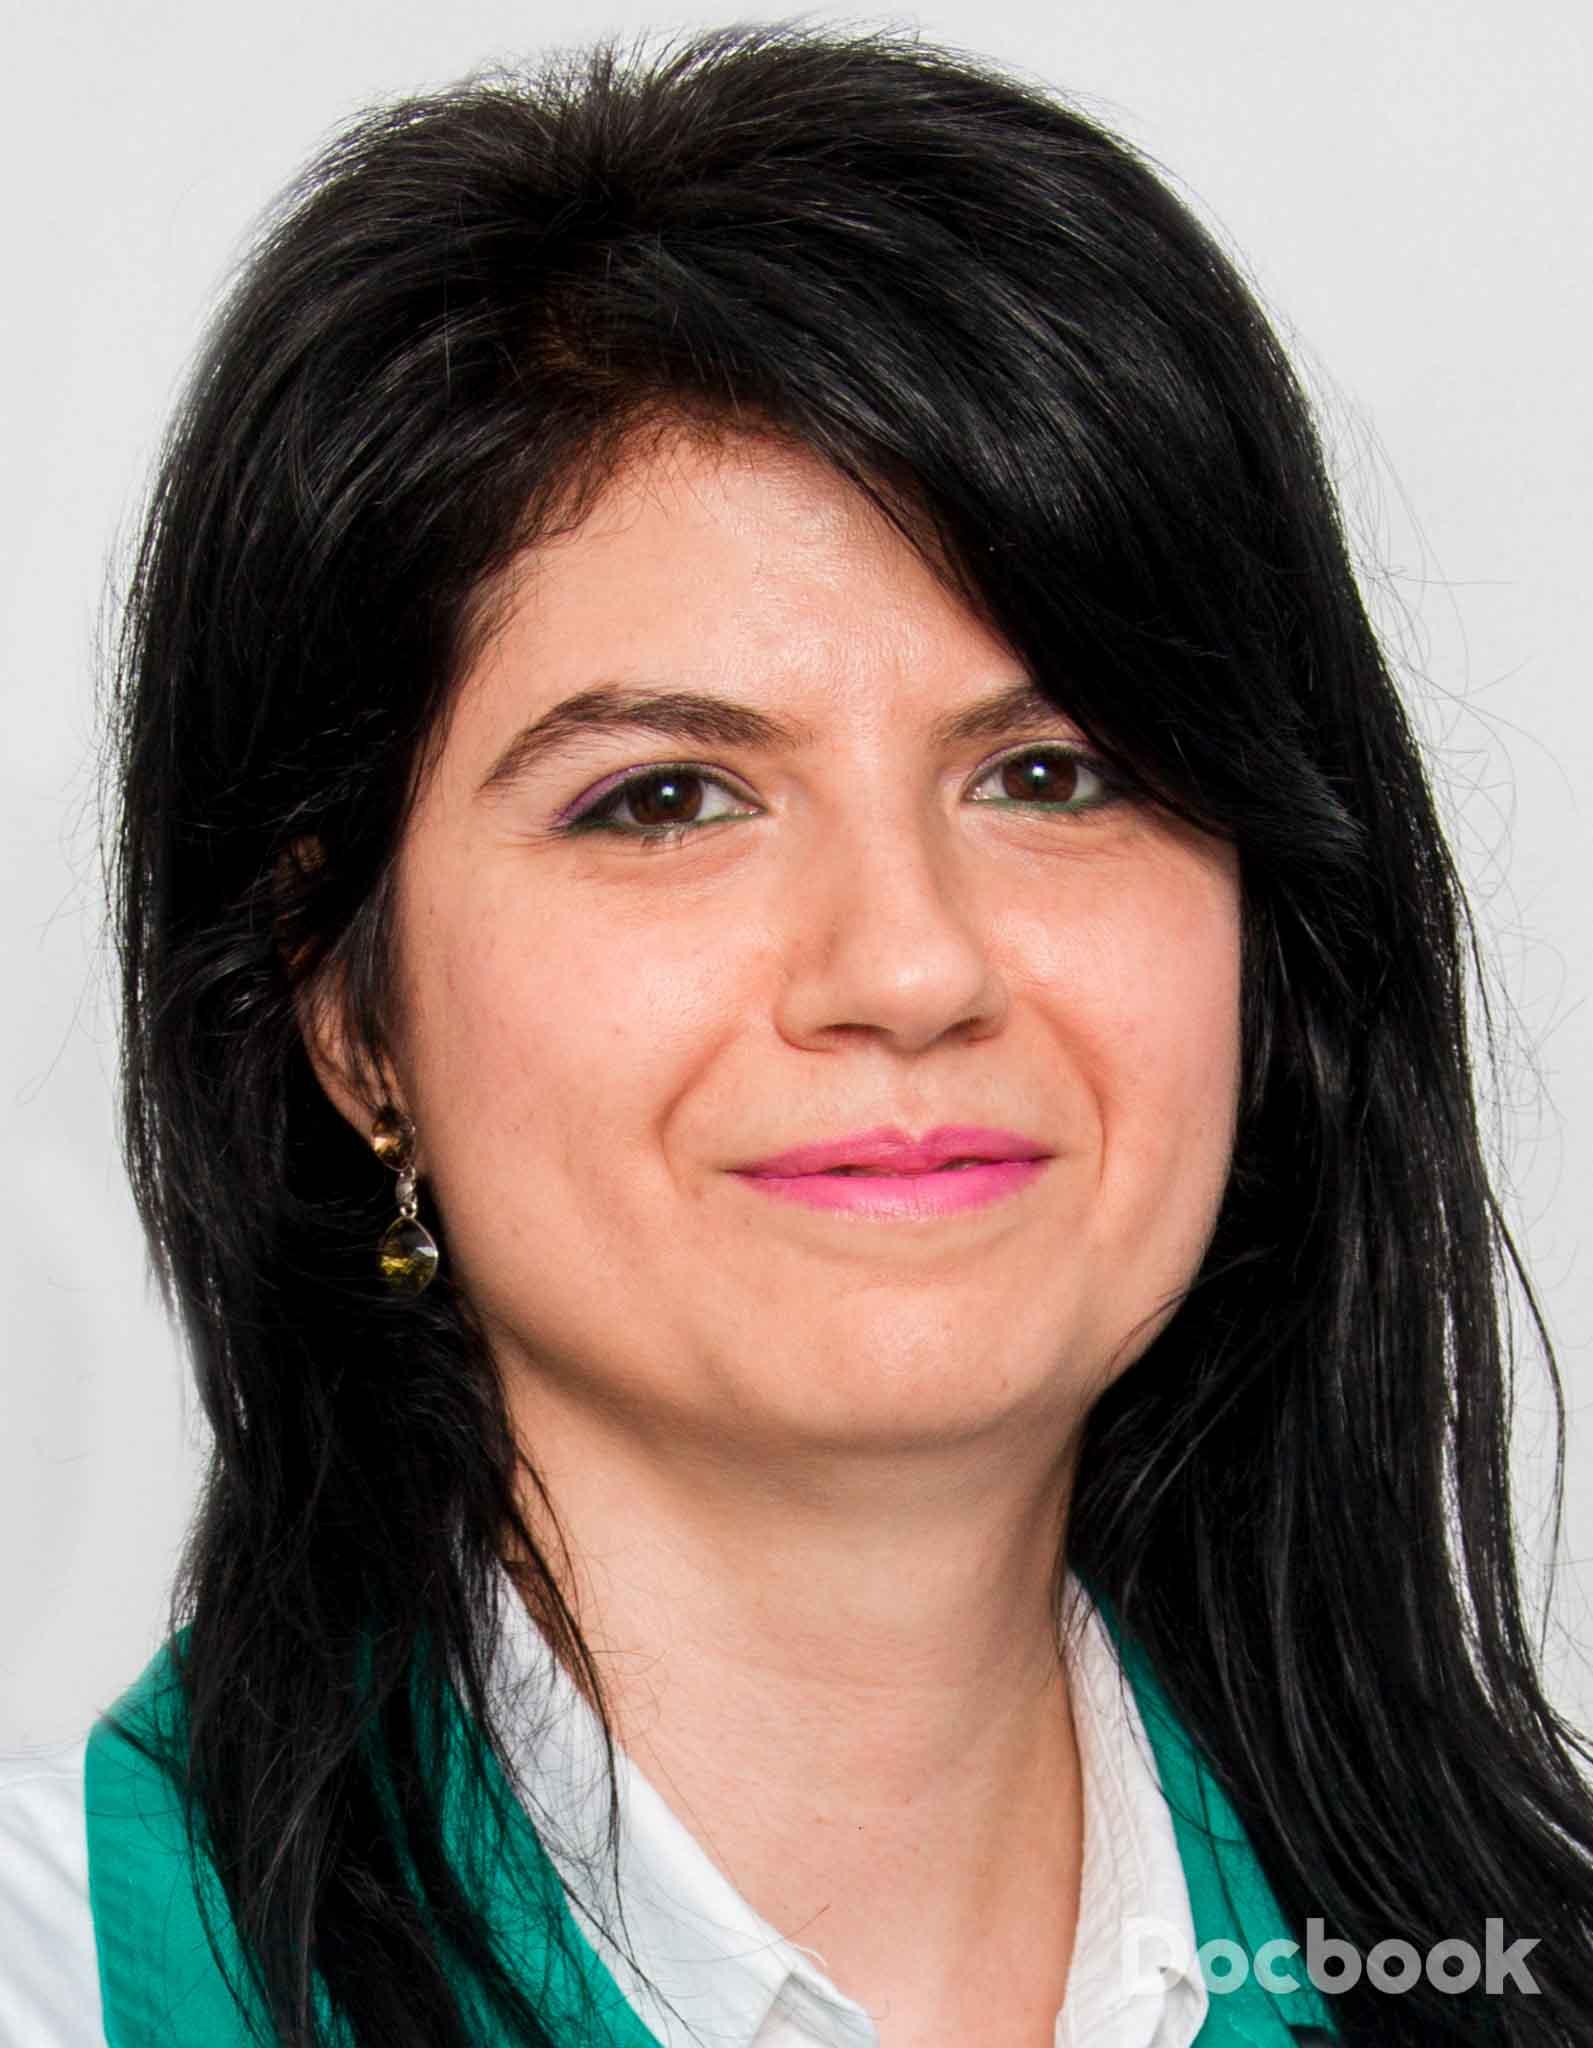 Dr. Valeria-Maria Vlaicu